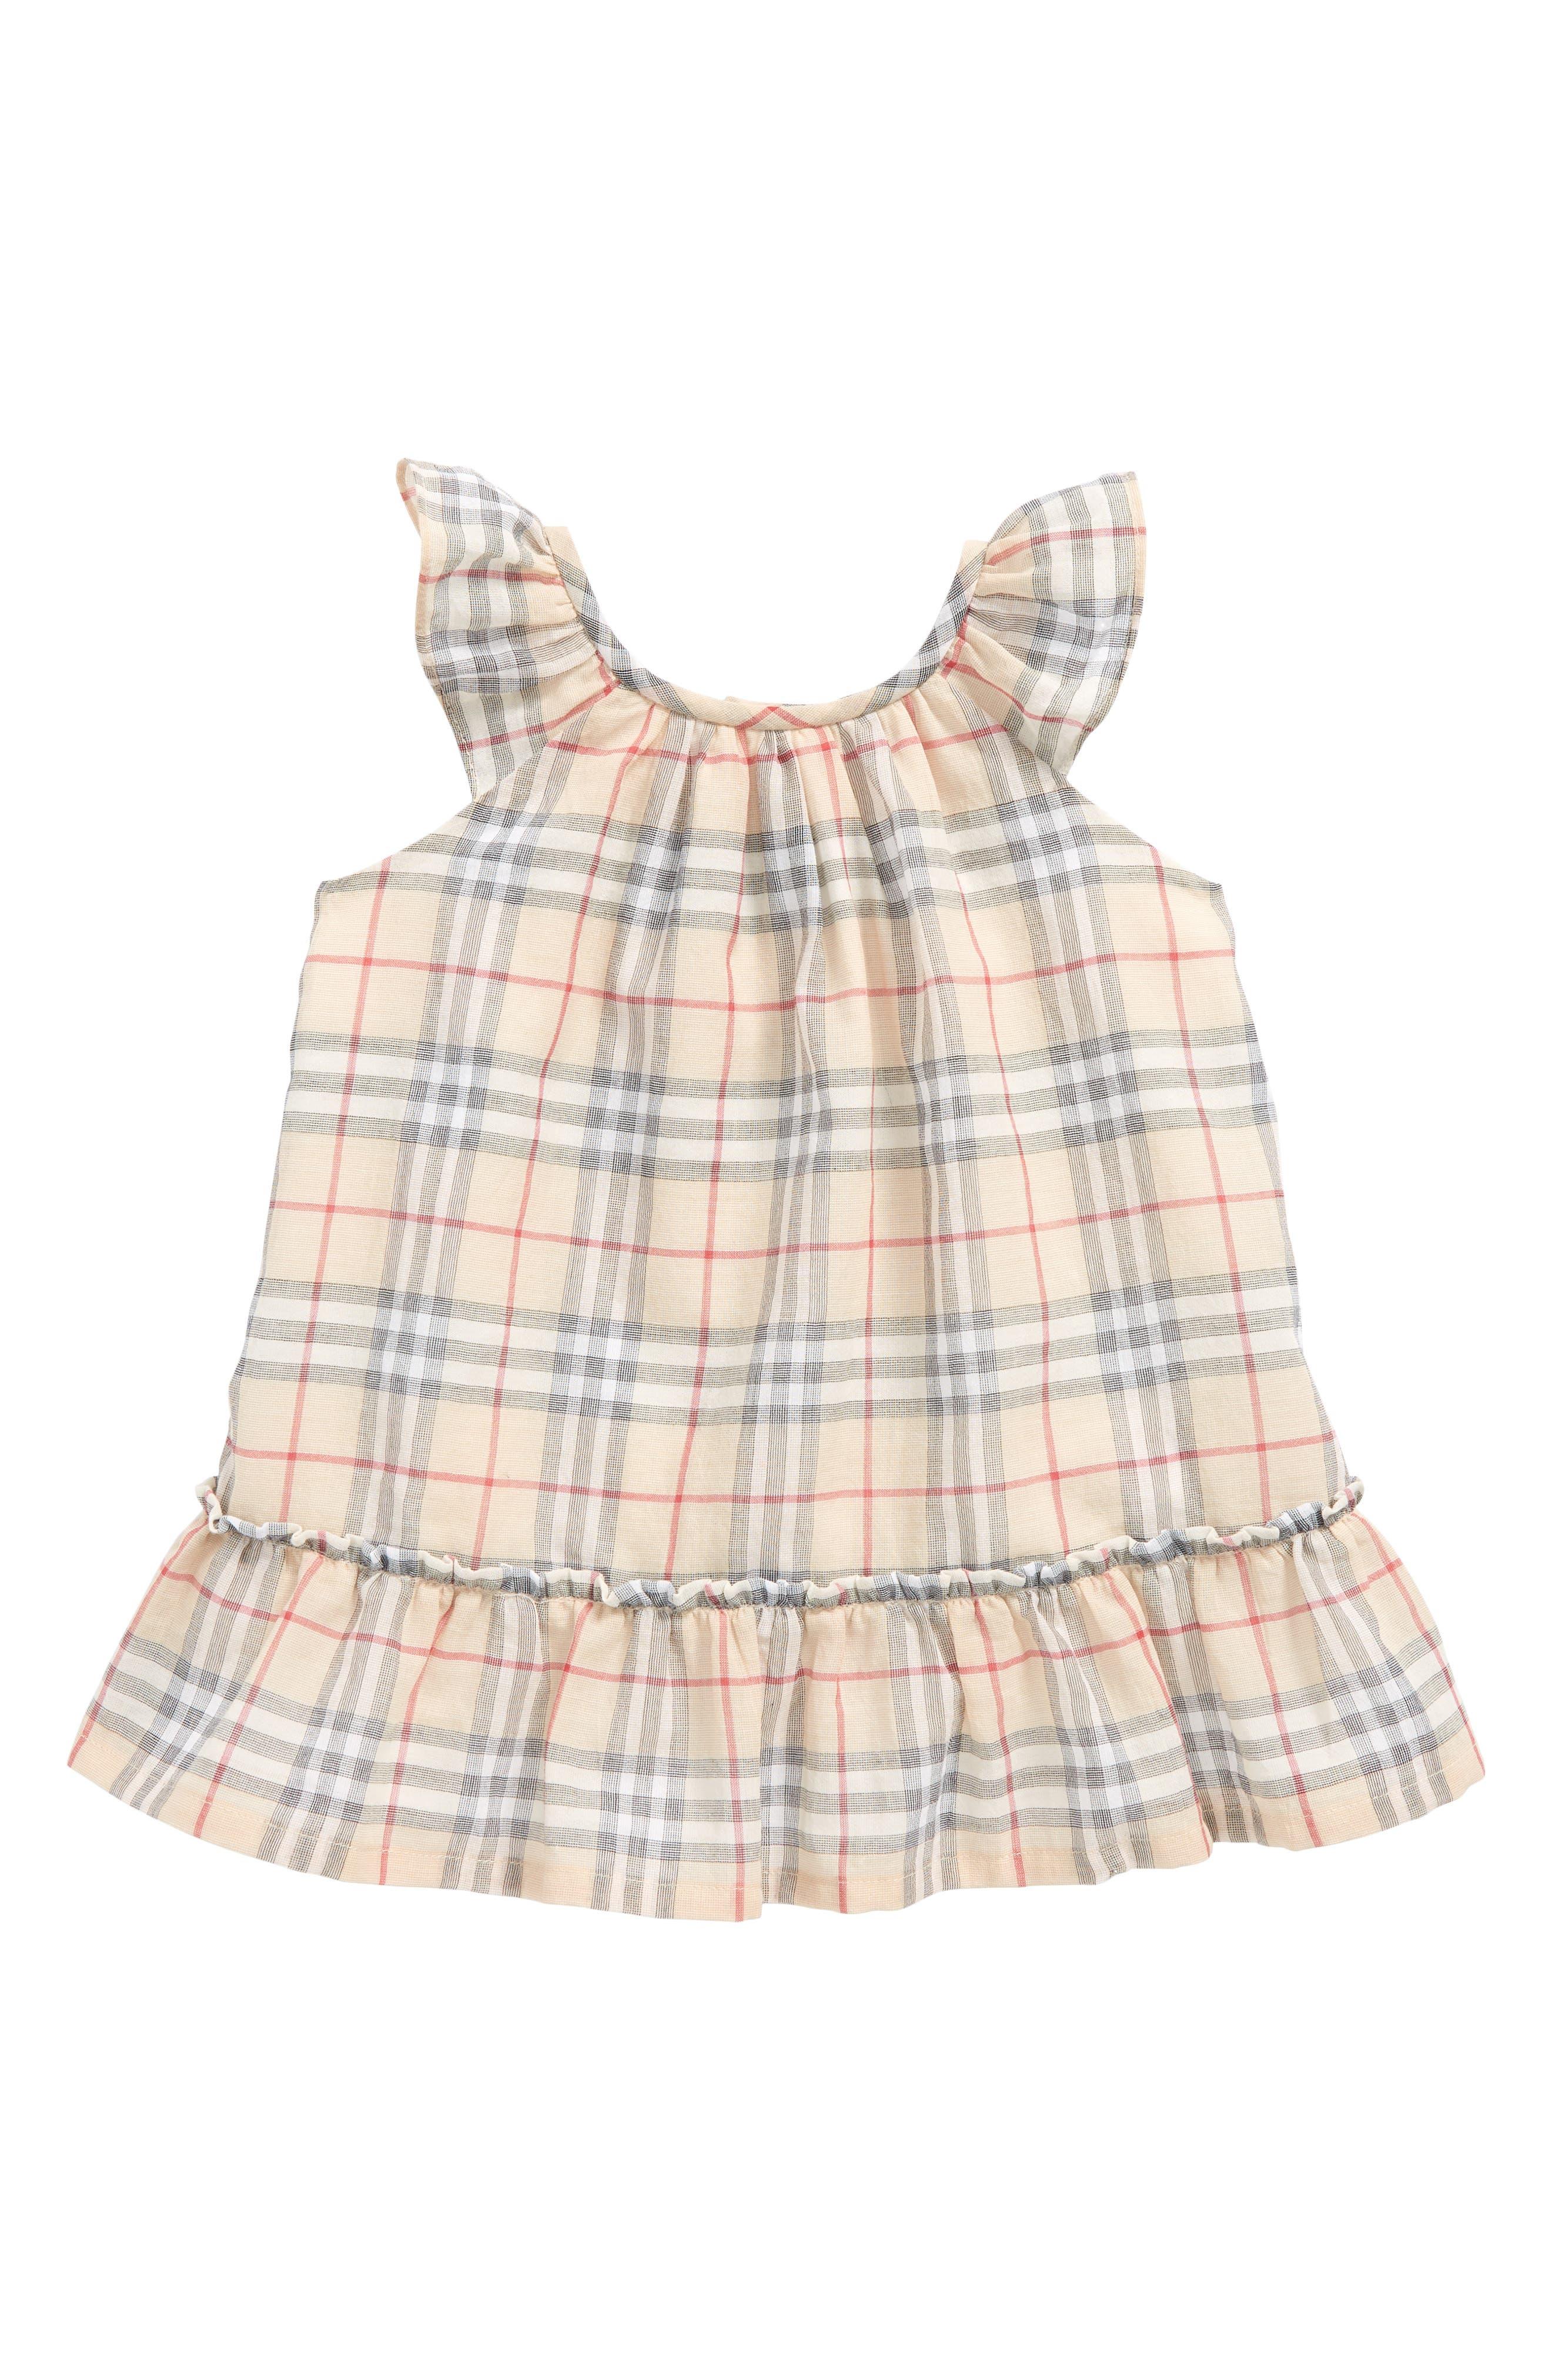 Main Image - Burberry Tania Check Dress (Baby Girls)